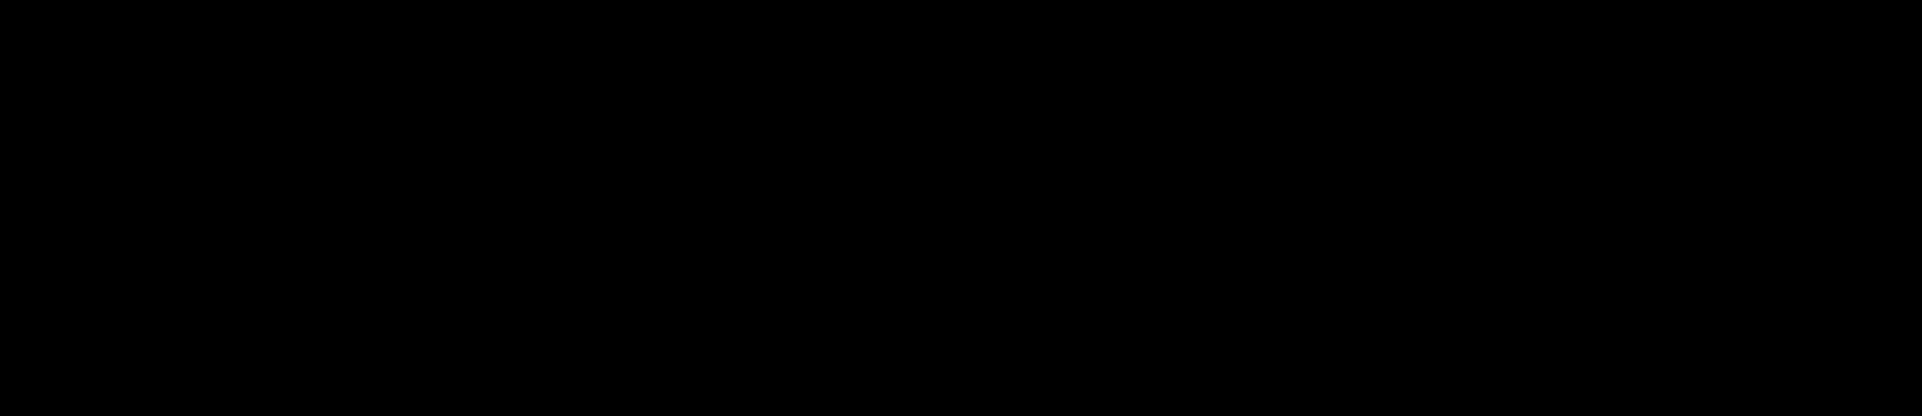 Anime Charlotte ZHIEND Logo